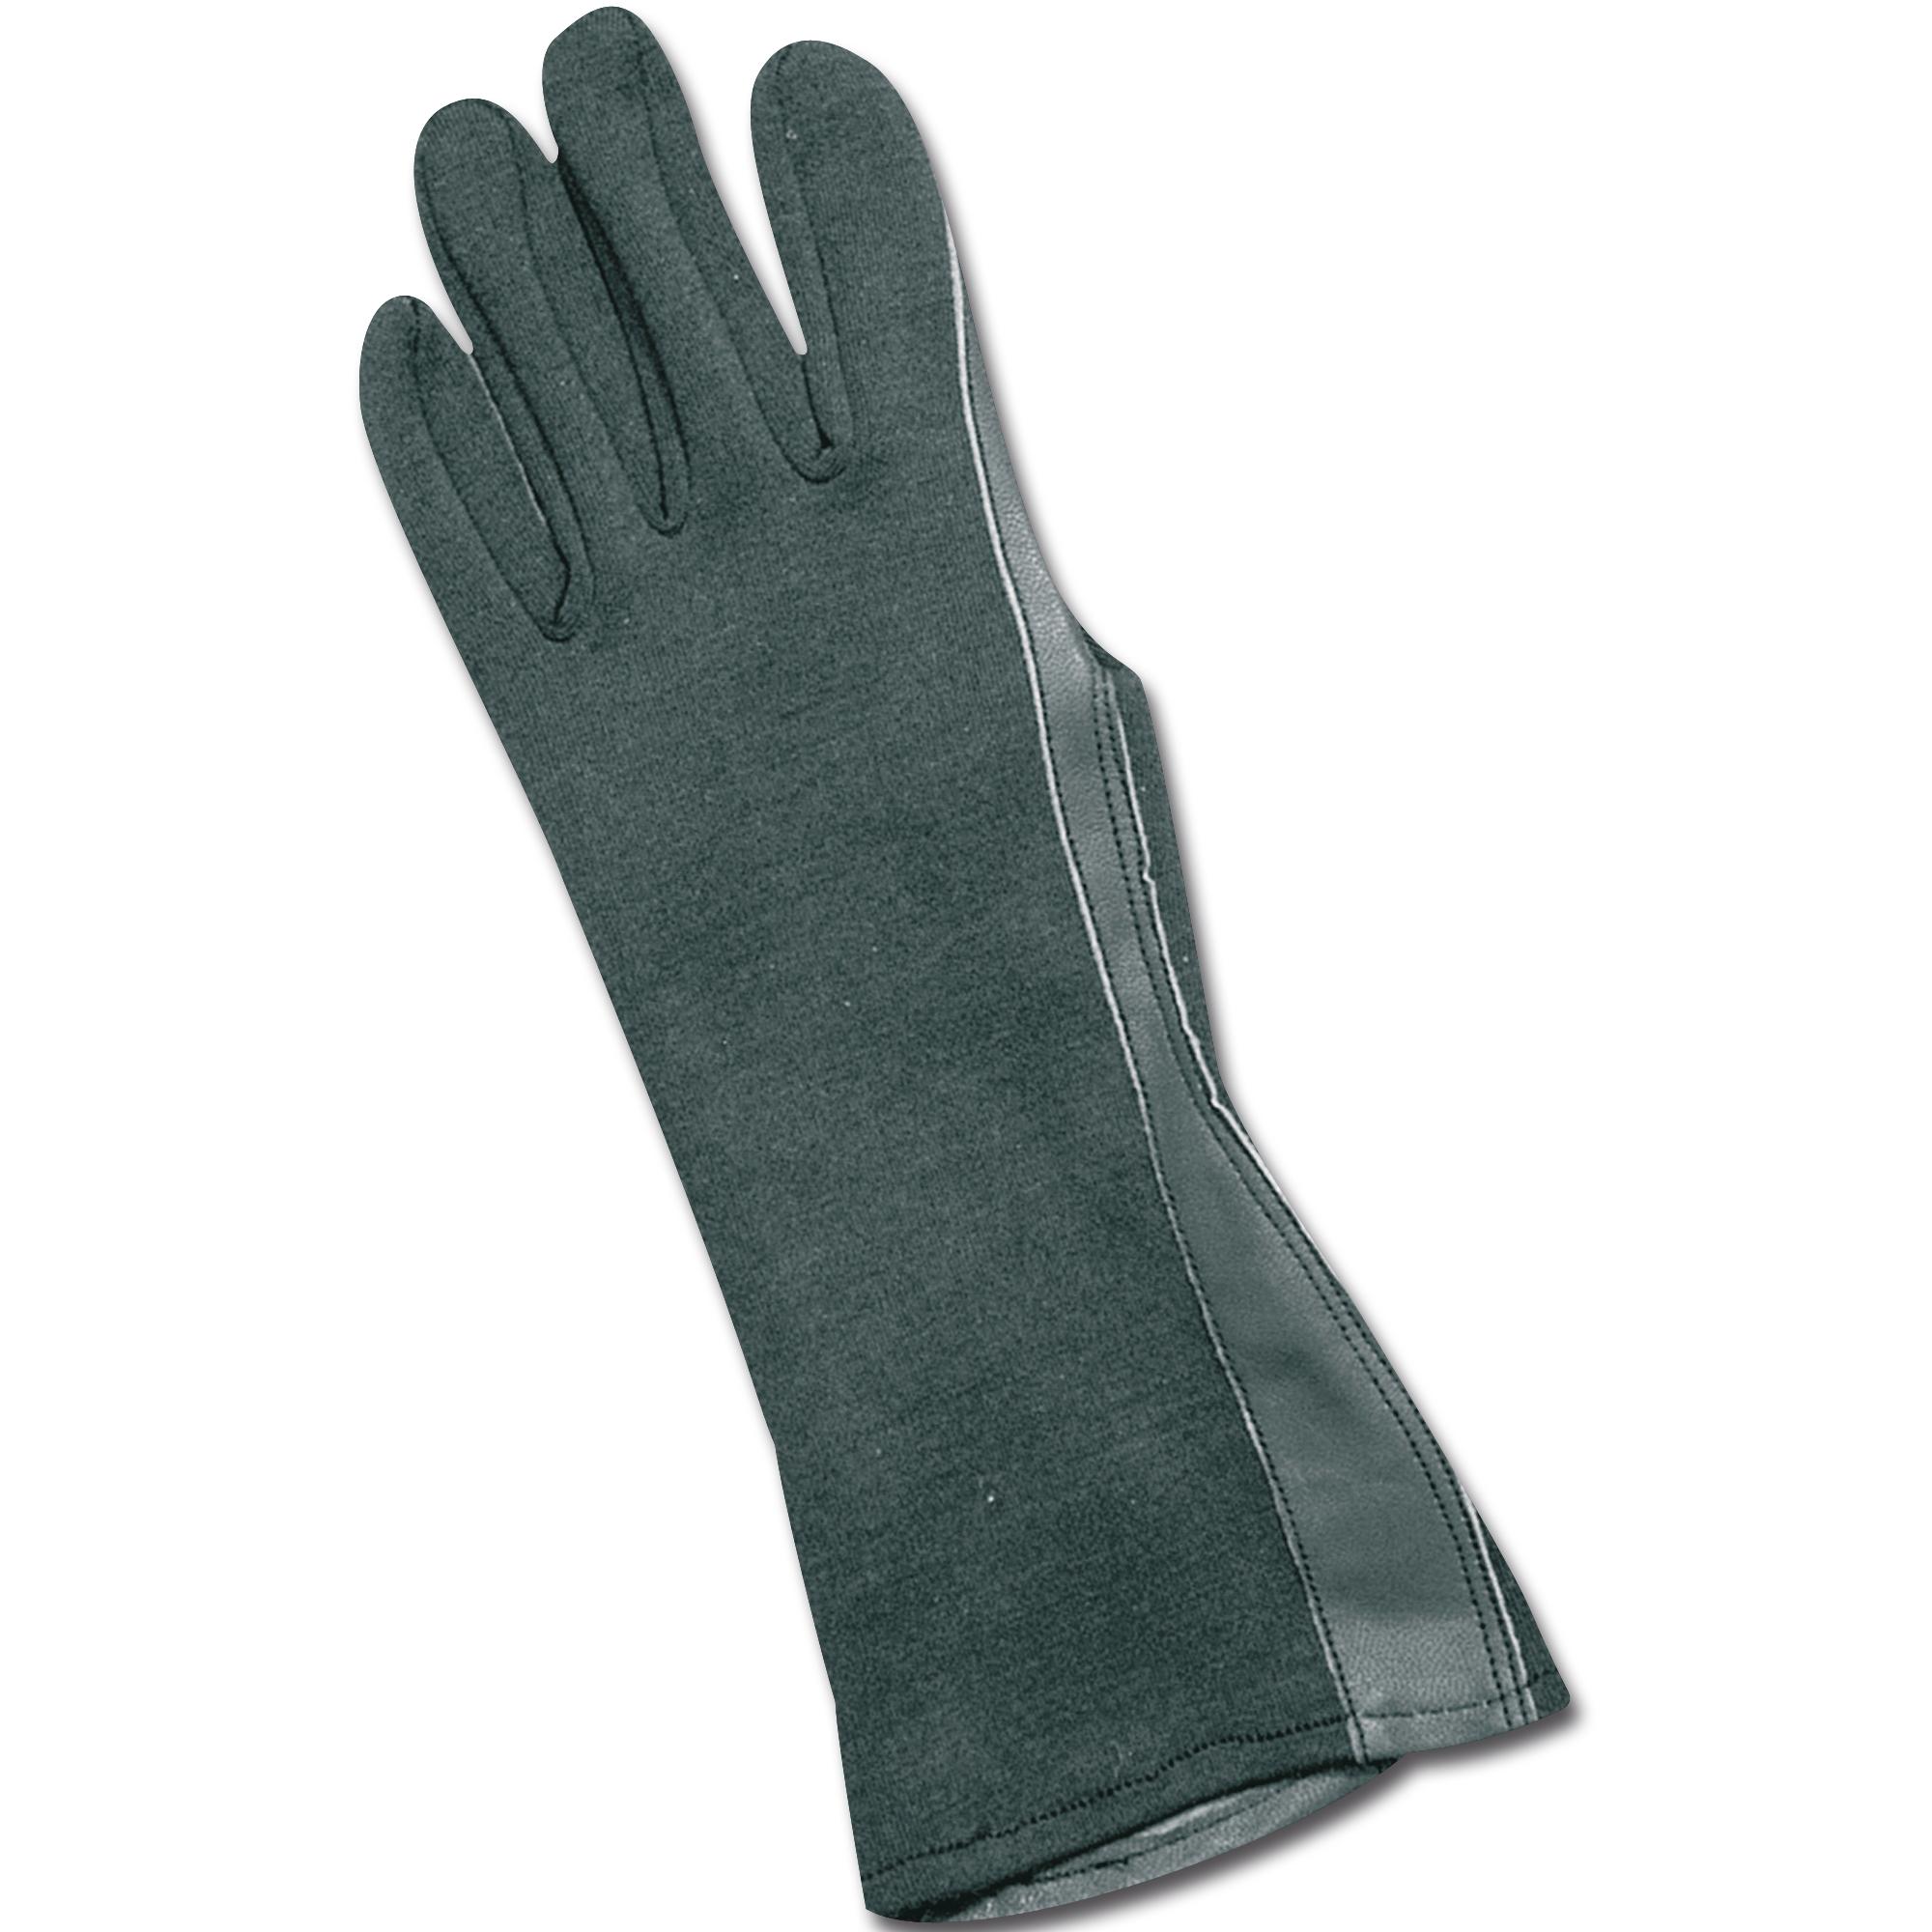 Handschuhe flammhemmend schwarz